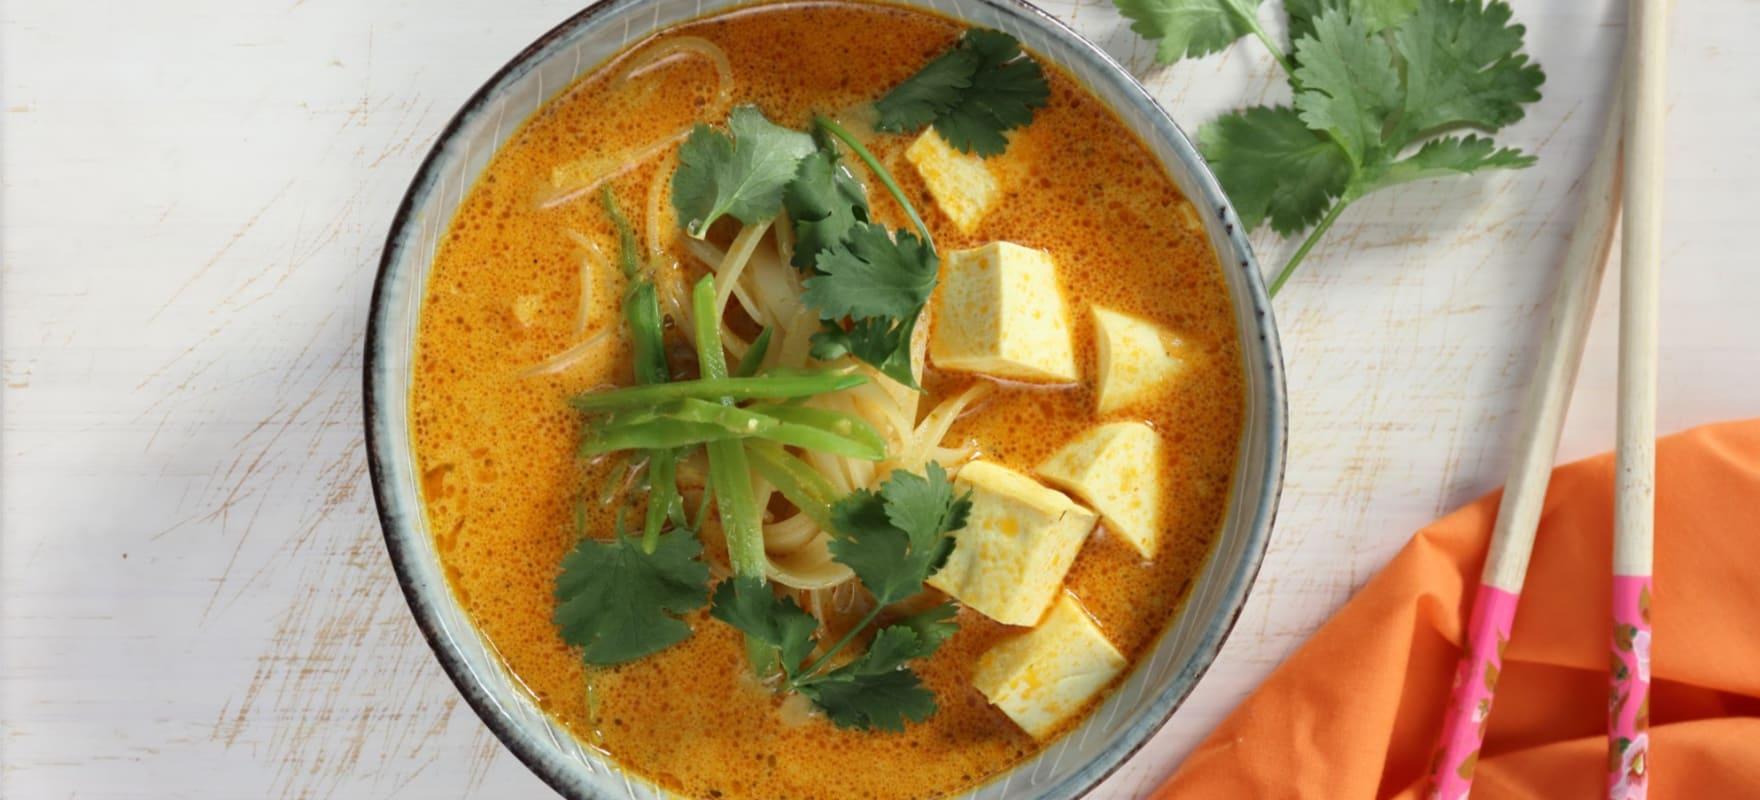 Vegetarian laksa with tofu image 1